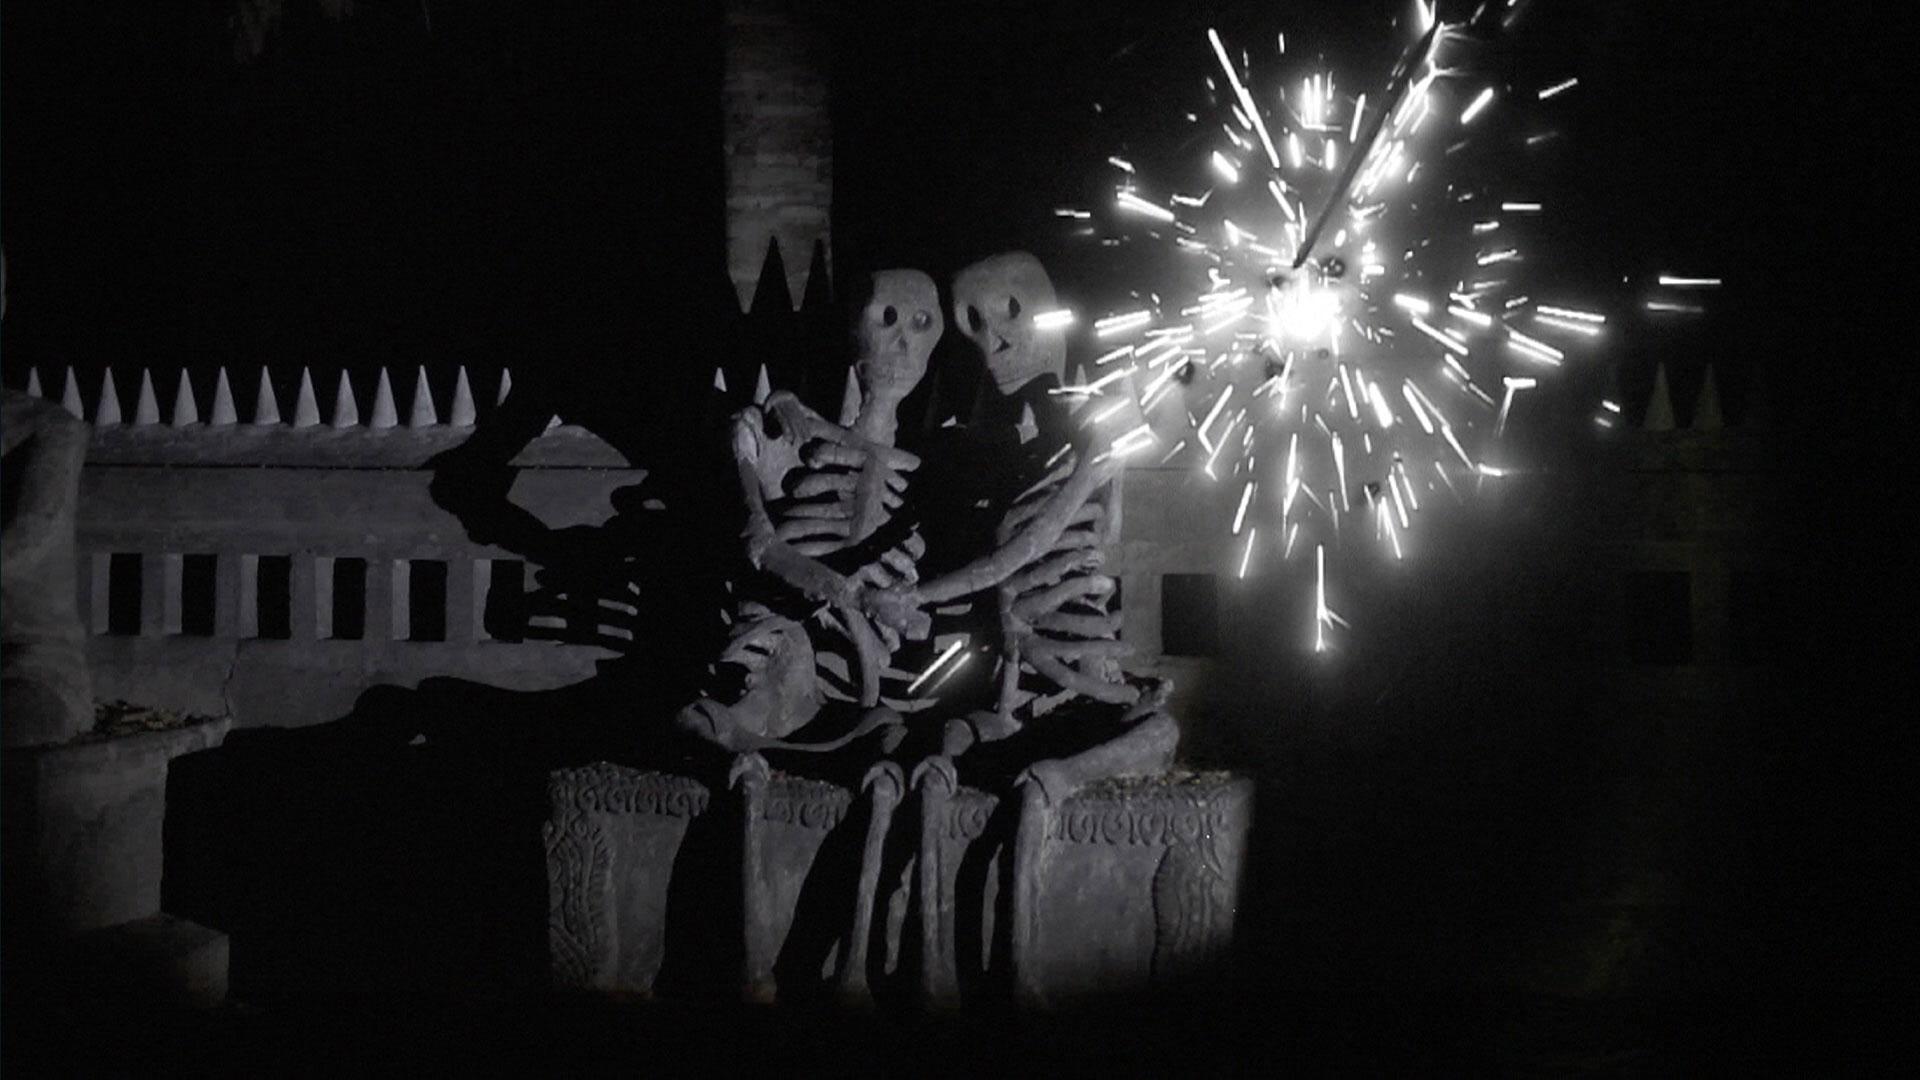 UVP_ApichatpongWeerasethakul_Fireworks-Archives_STILL-2